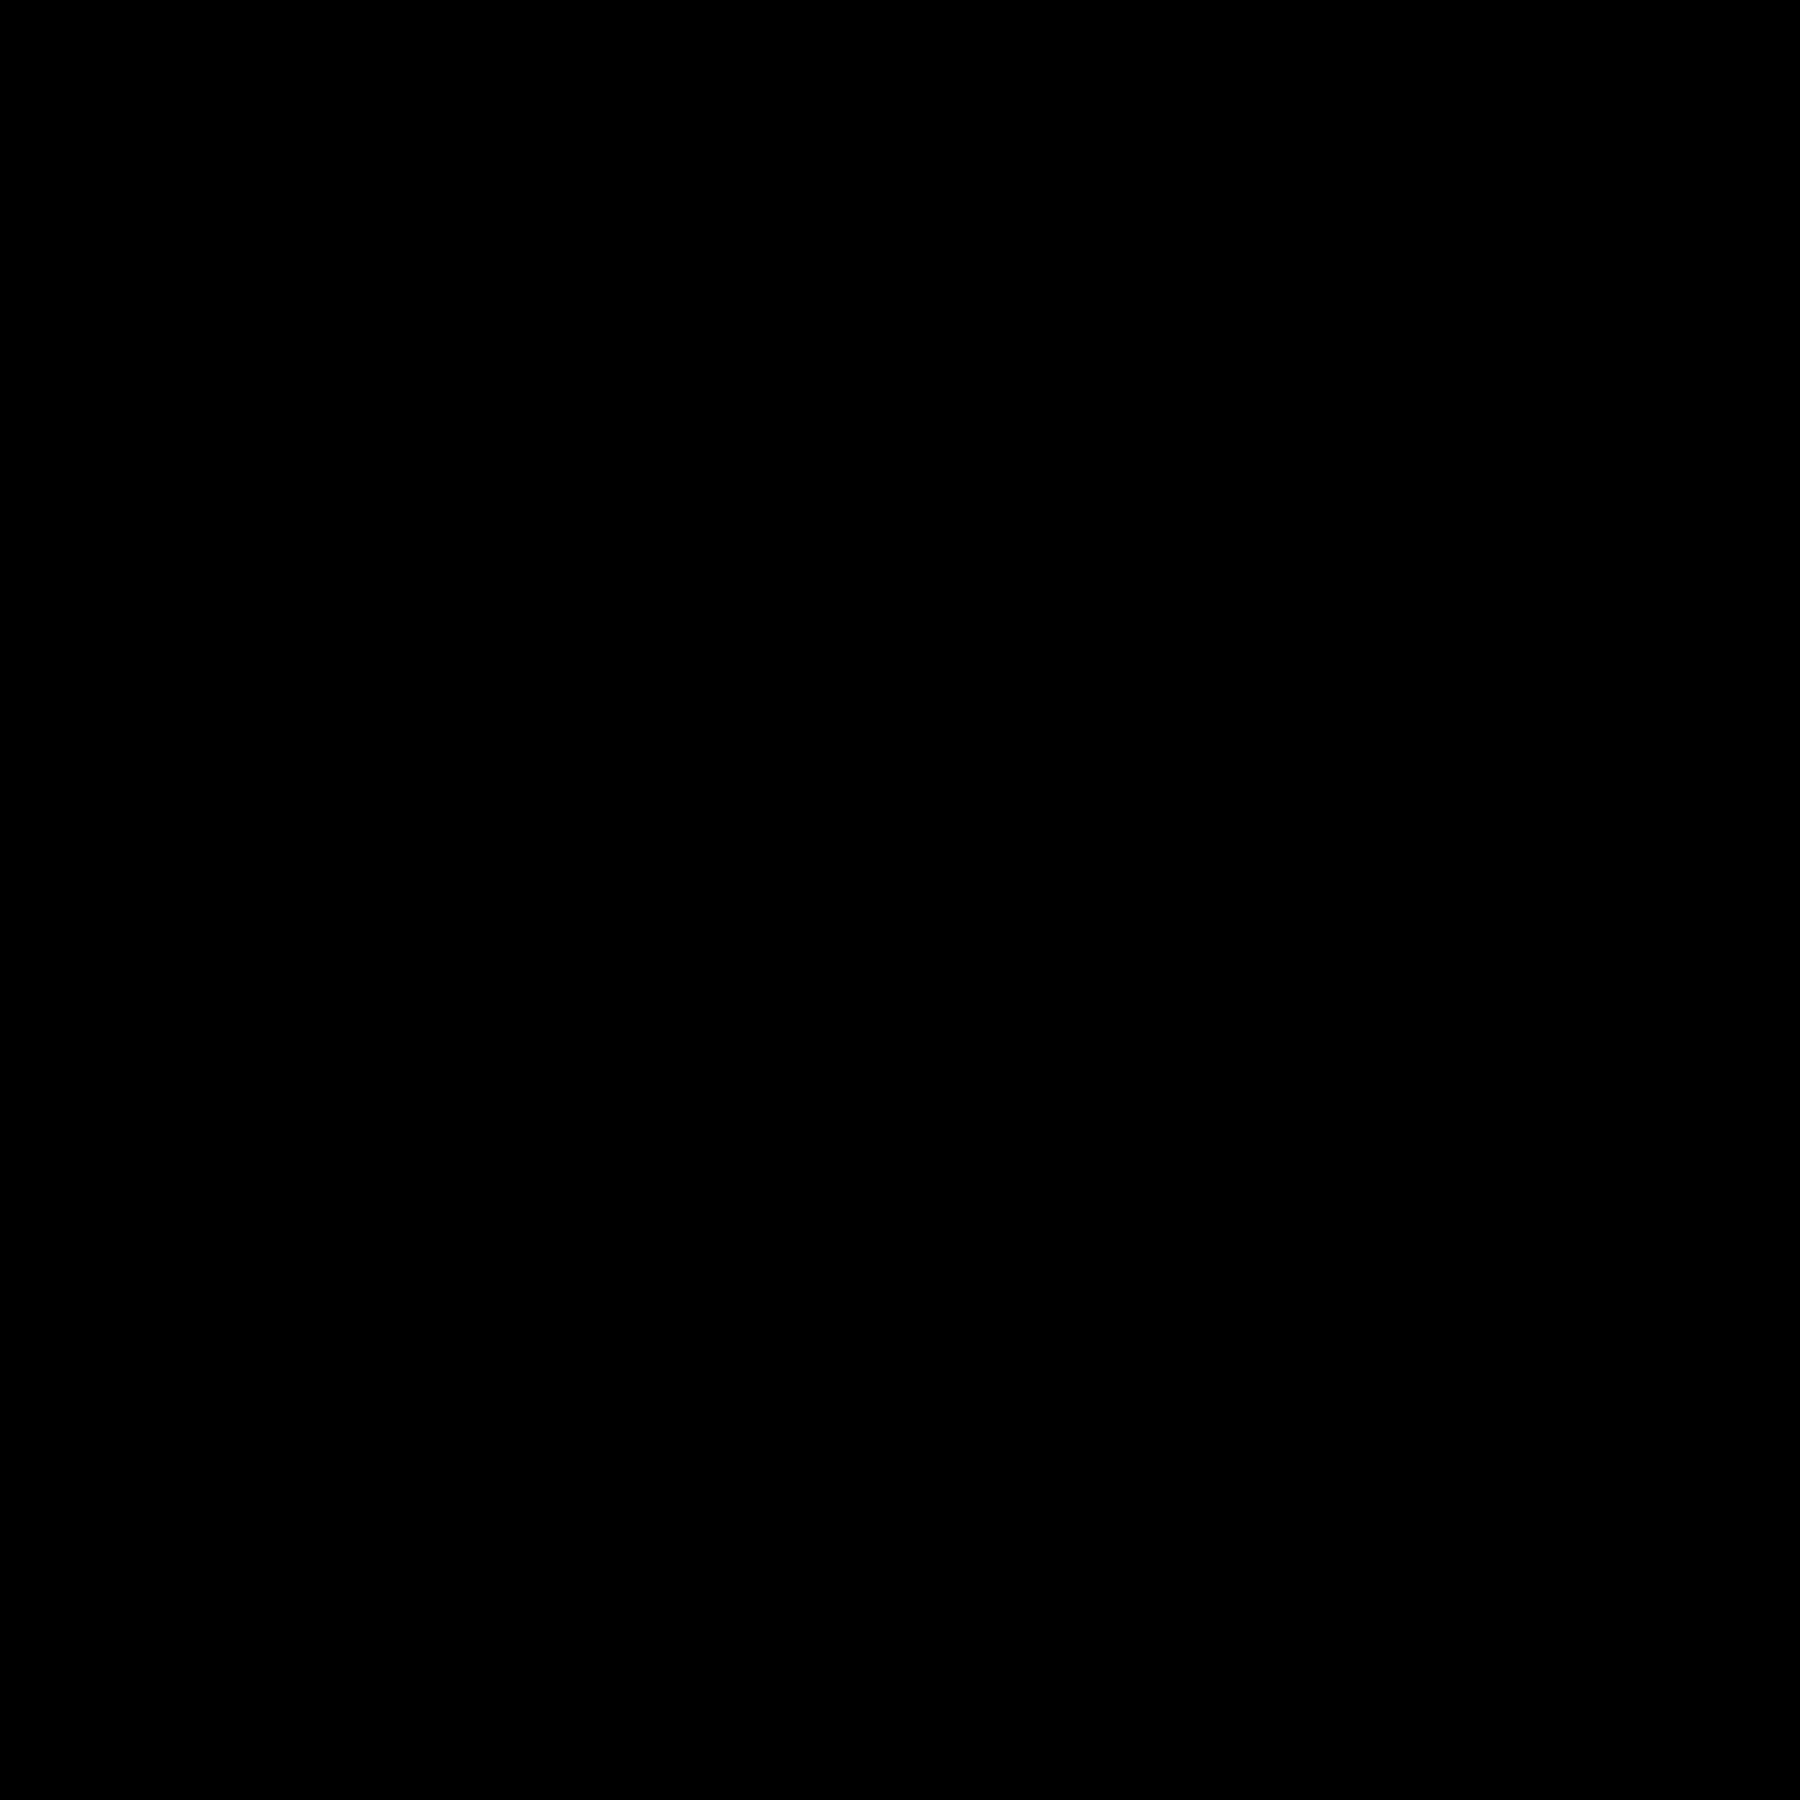 Achterlicht LED AEB rechthoek 3-functie 12/24v